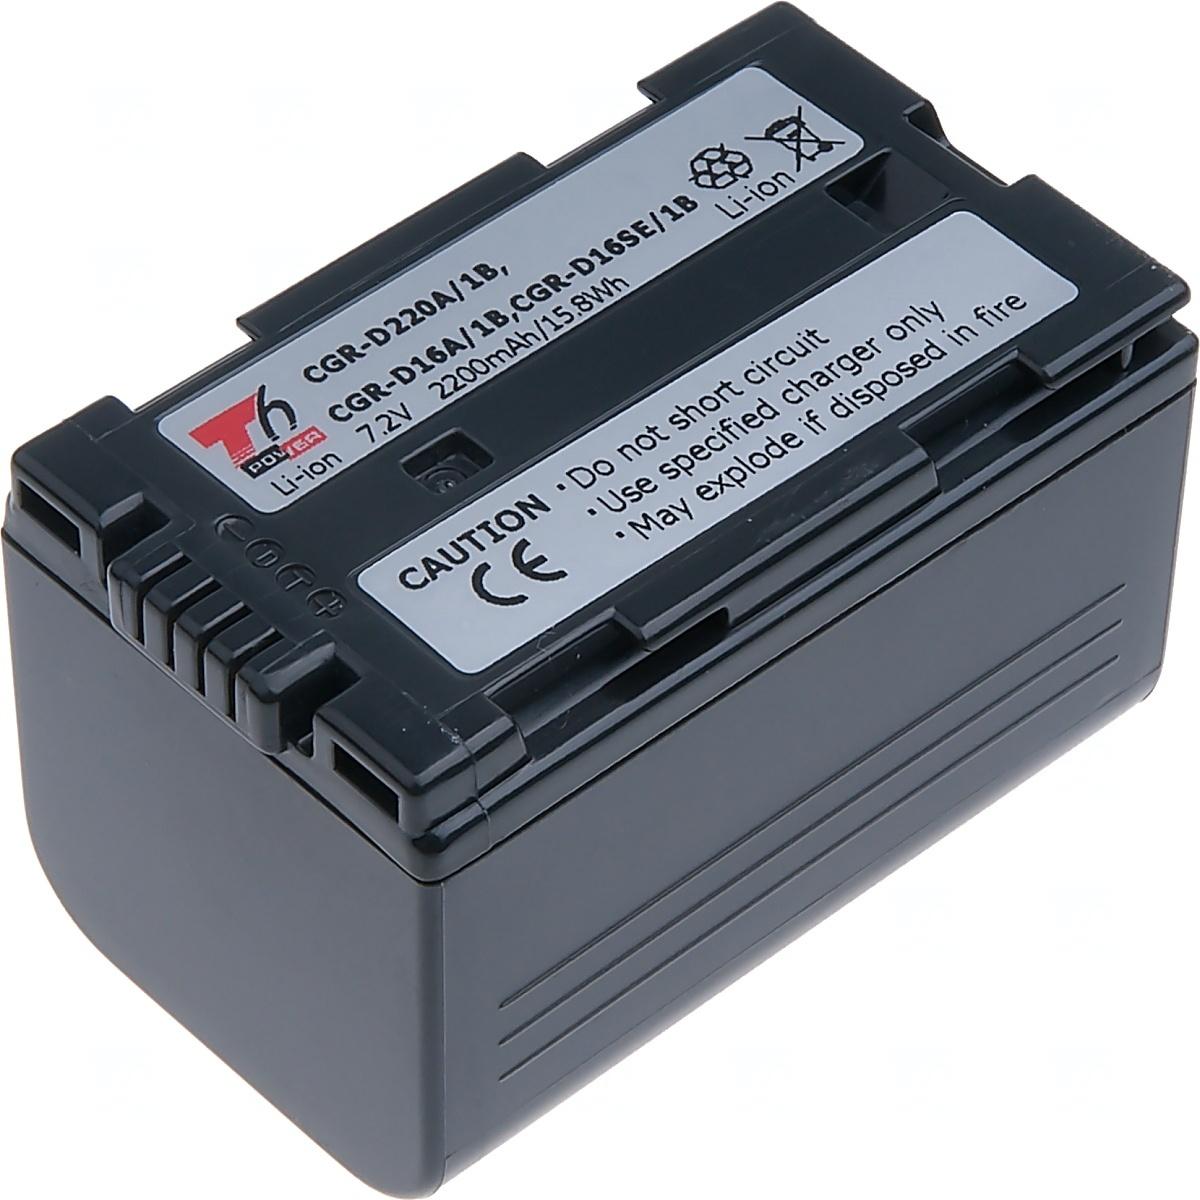 Baterie T6 power Panasonic CGR-D220A/1B, CGR-D16A/1B, 2200mAh, šedá